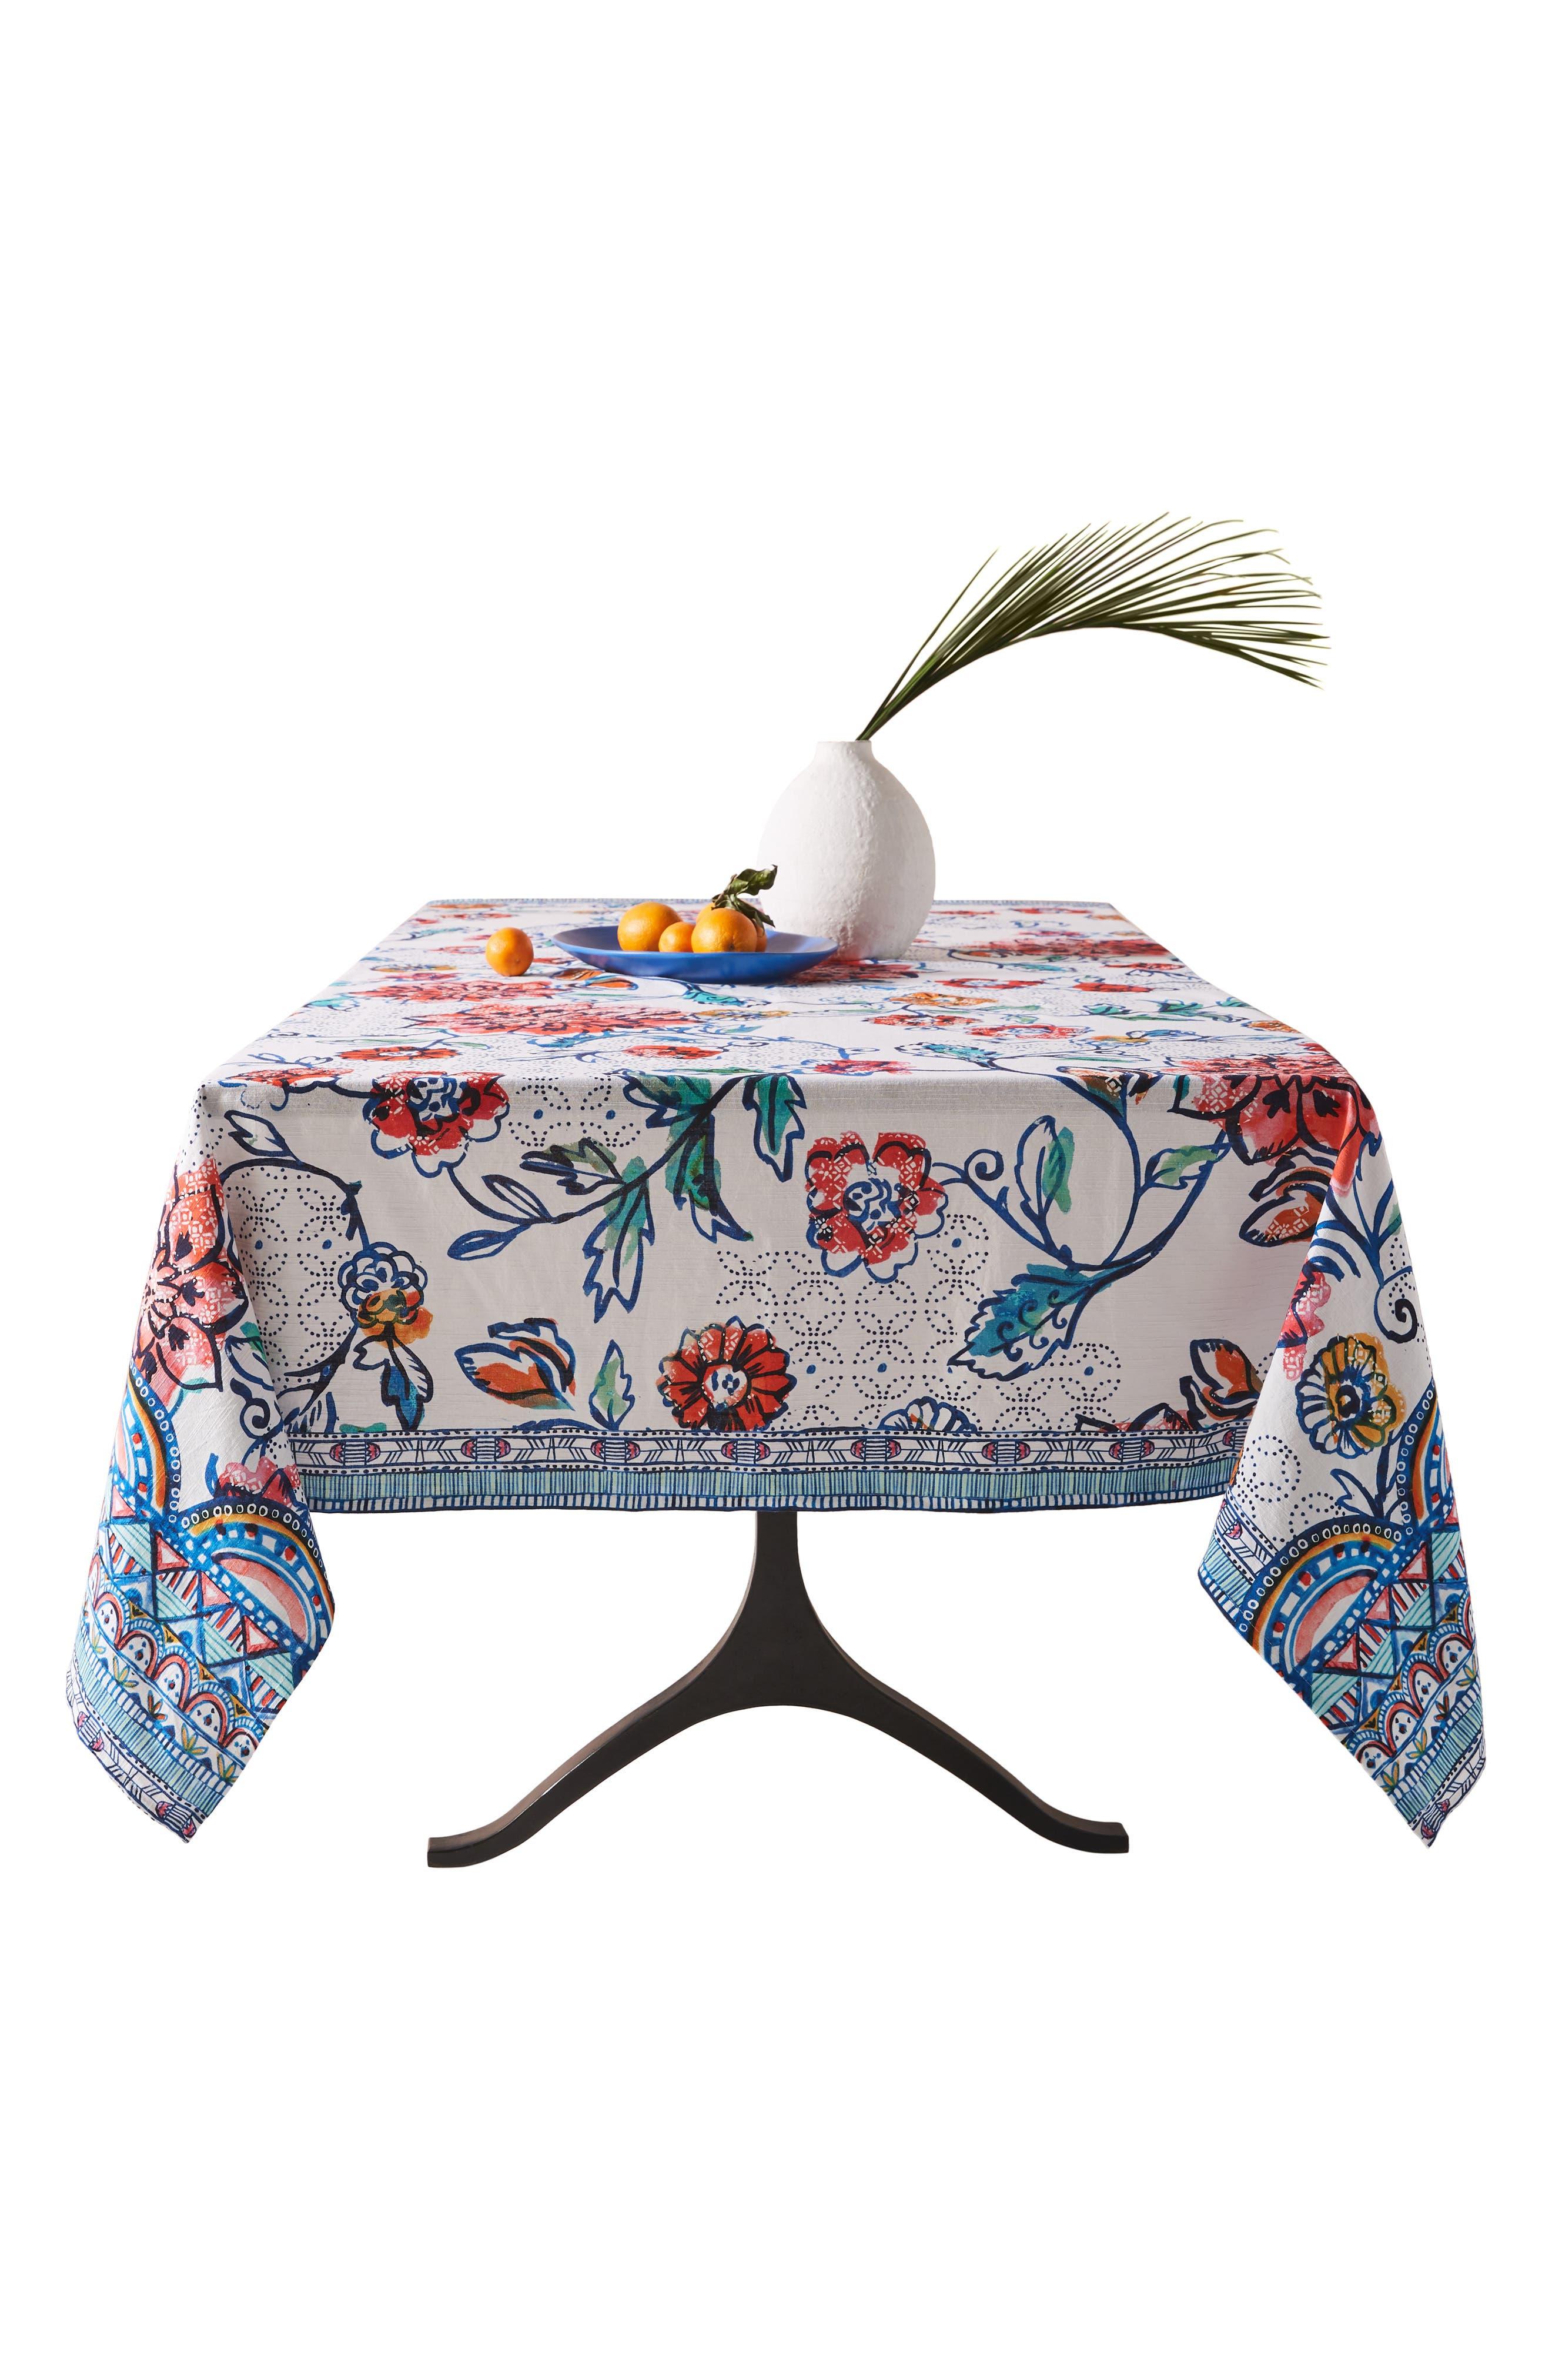 ANTHROPOLOGIE, Belinda Tablecloth, Alternate thumbnail 4, color, TURQ